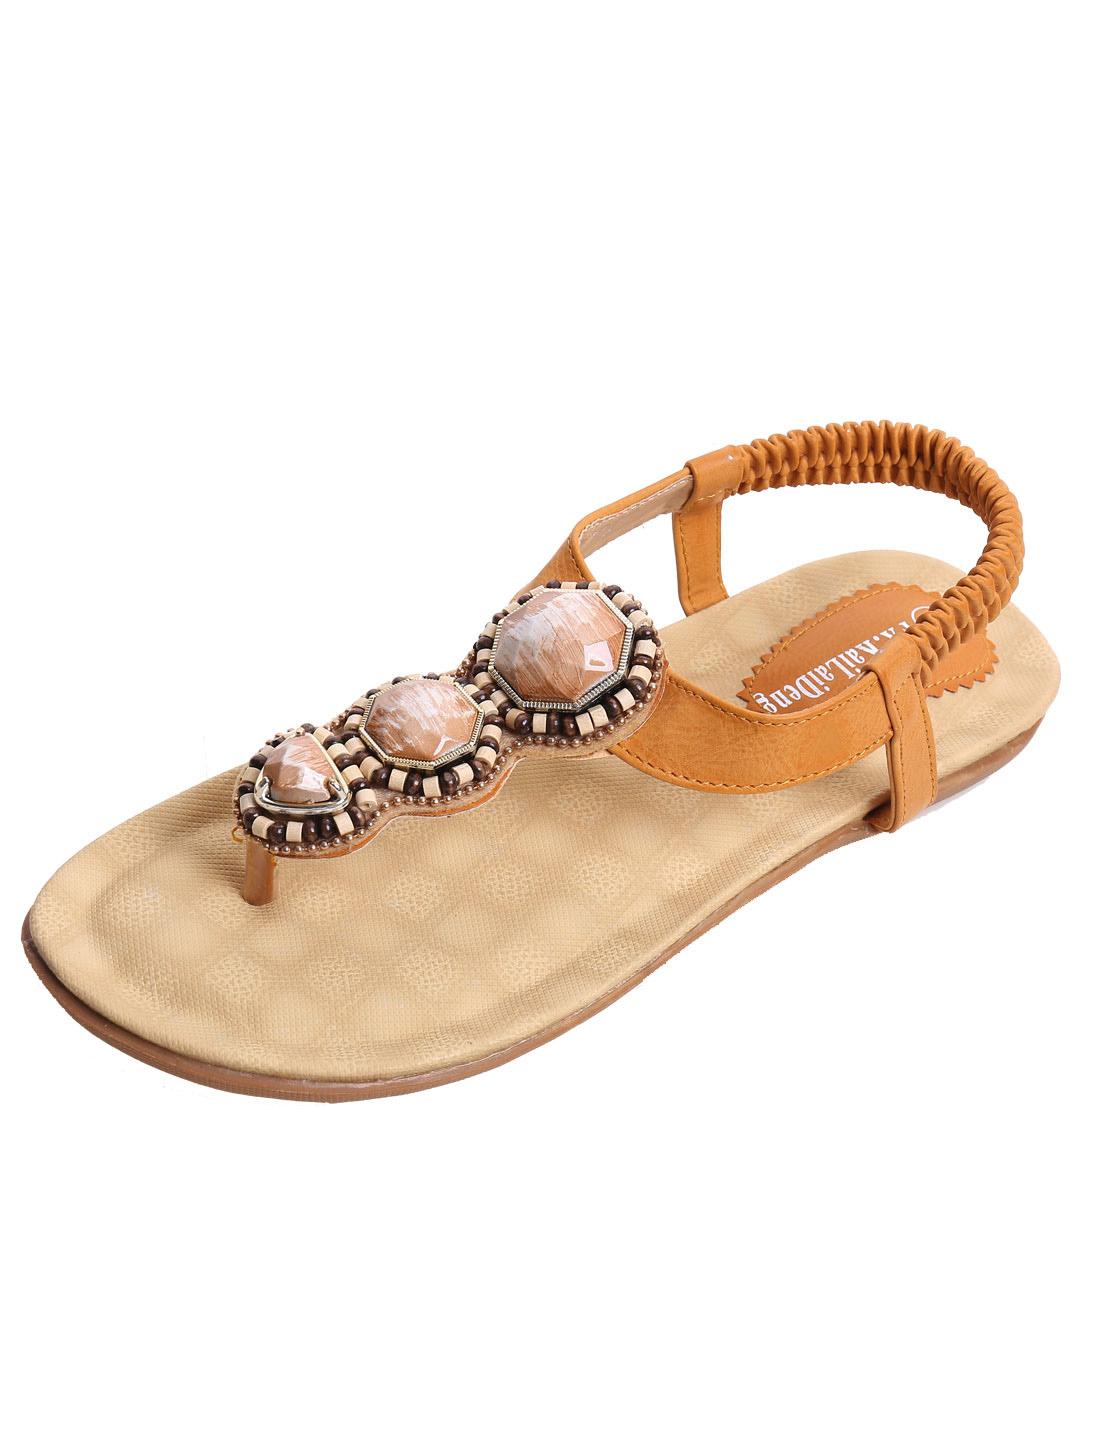 Women Rhinestones Embellished Textured Outside Flat Sandals Ochre US 8